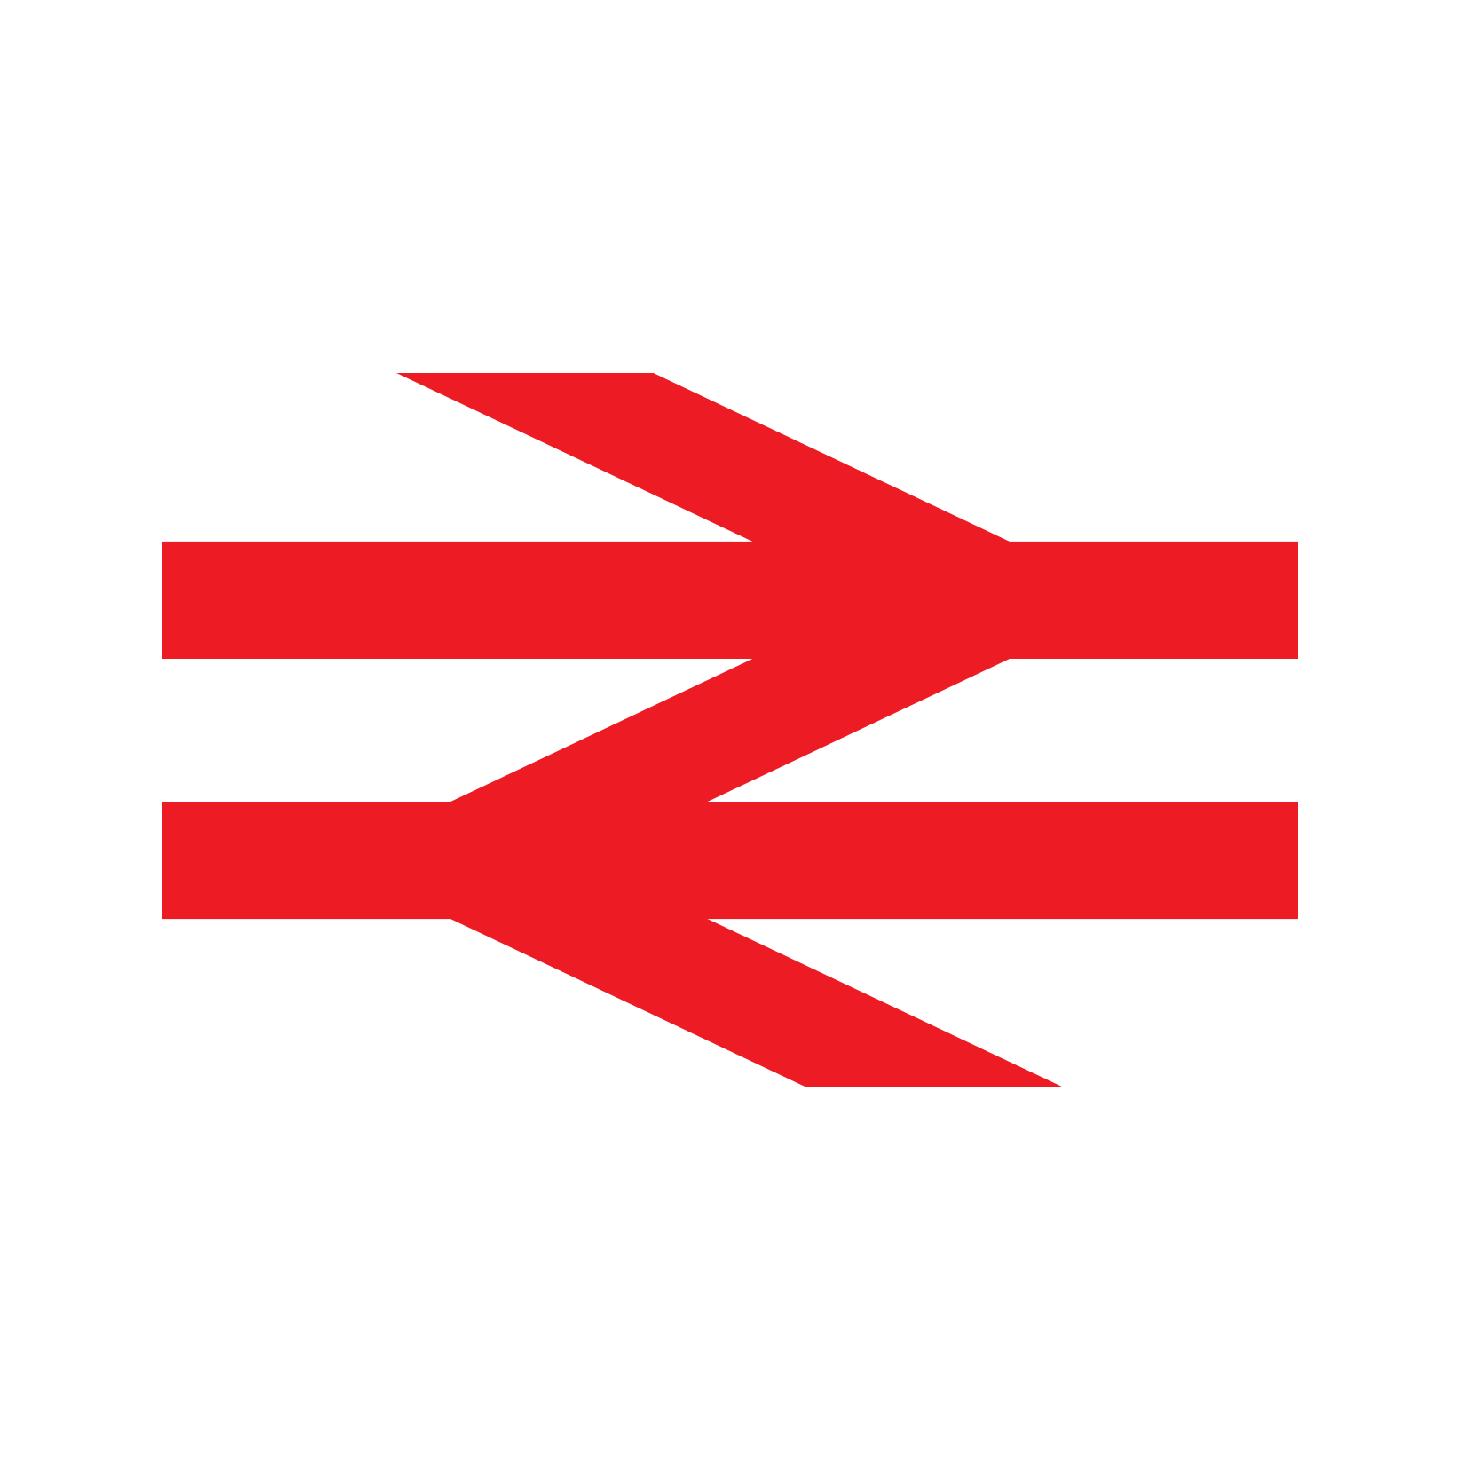 The Rail Industry logo